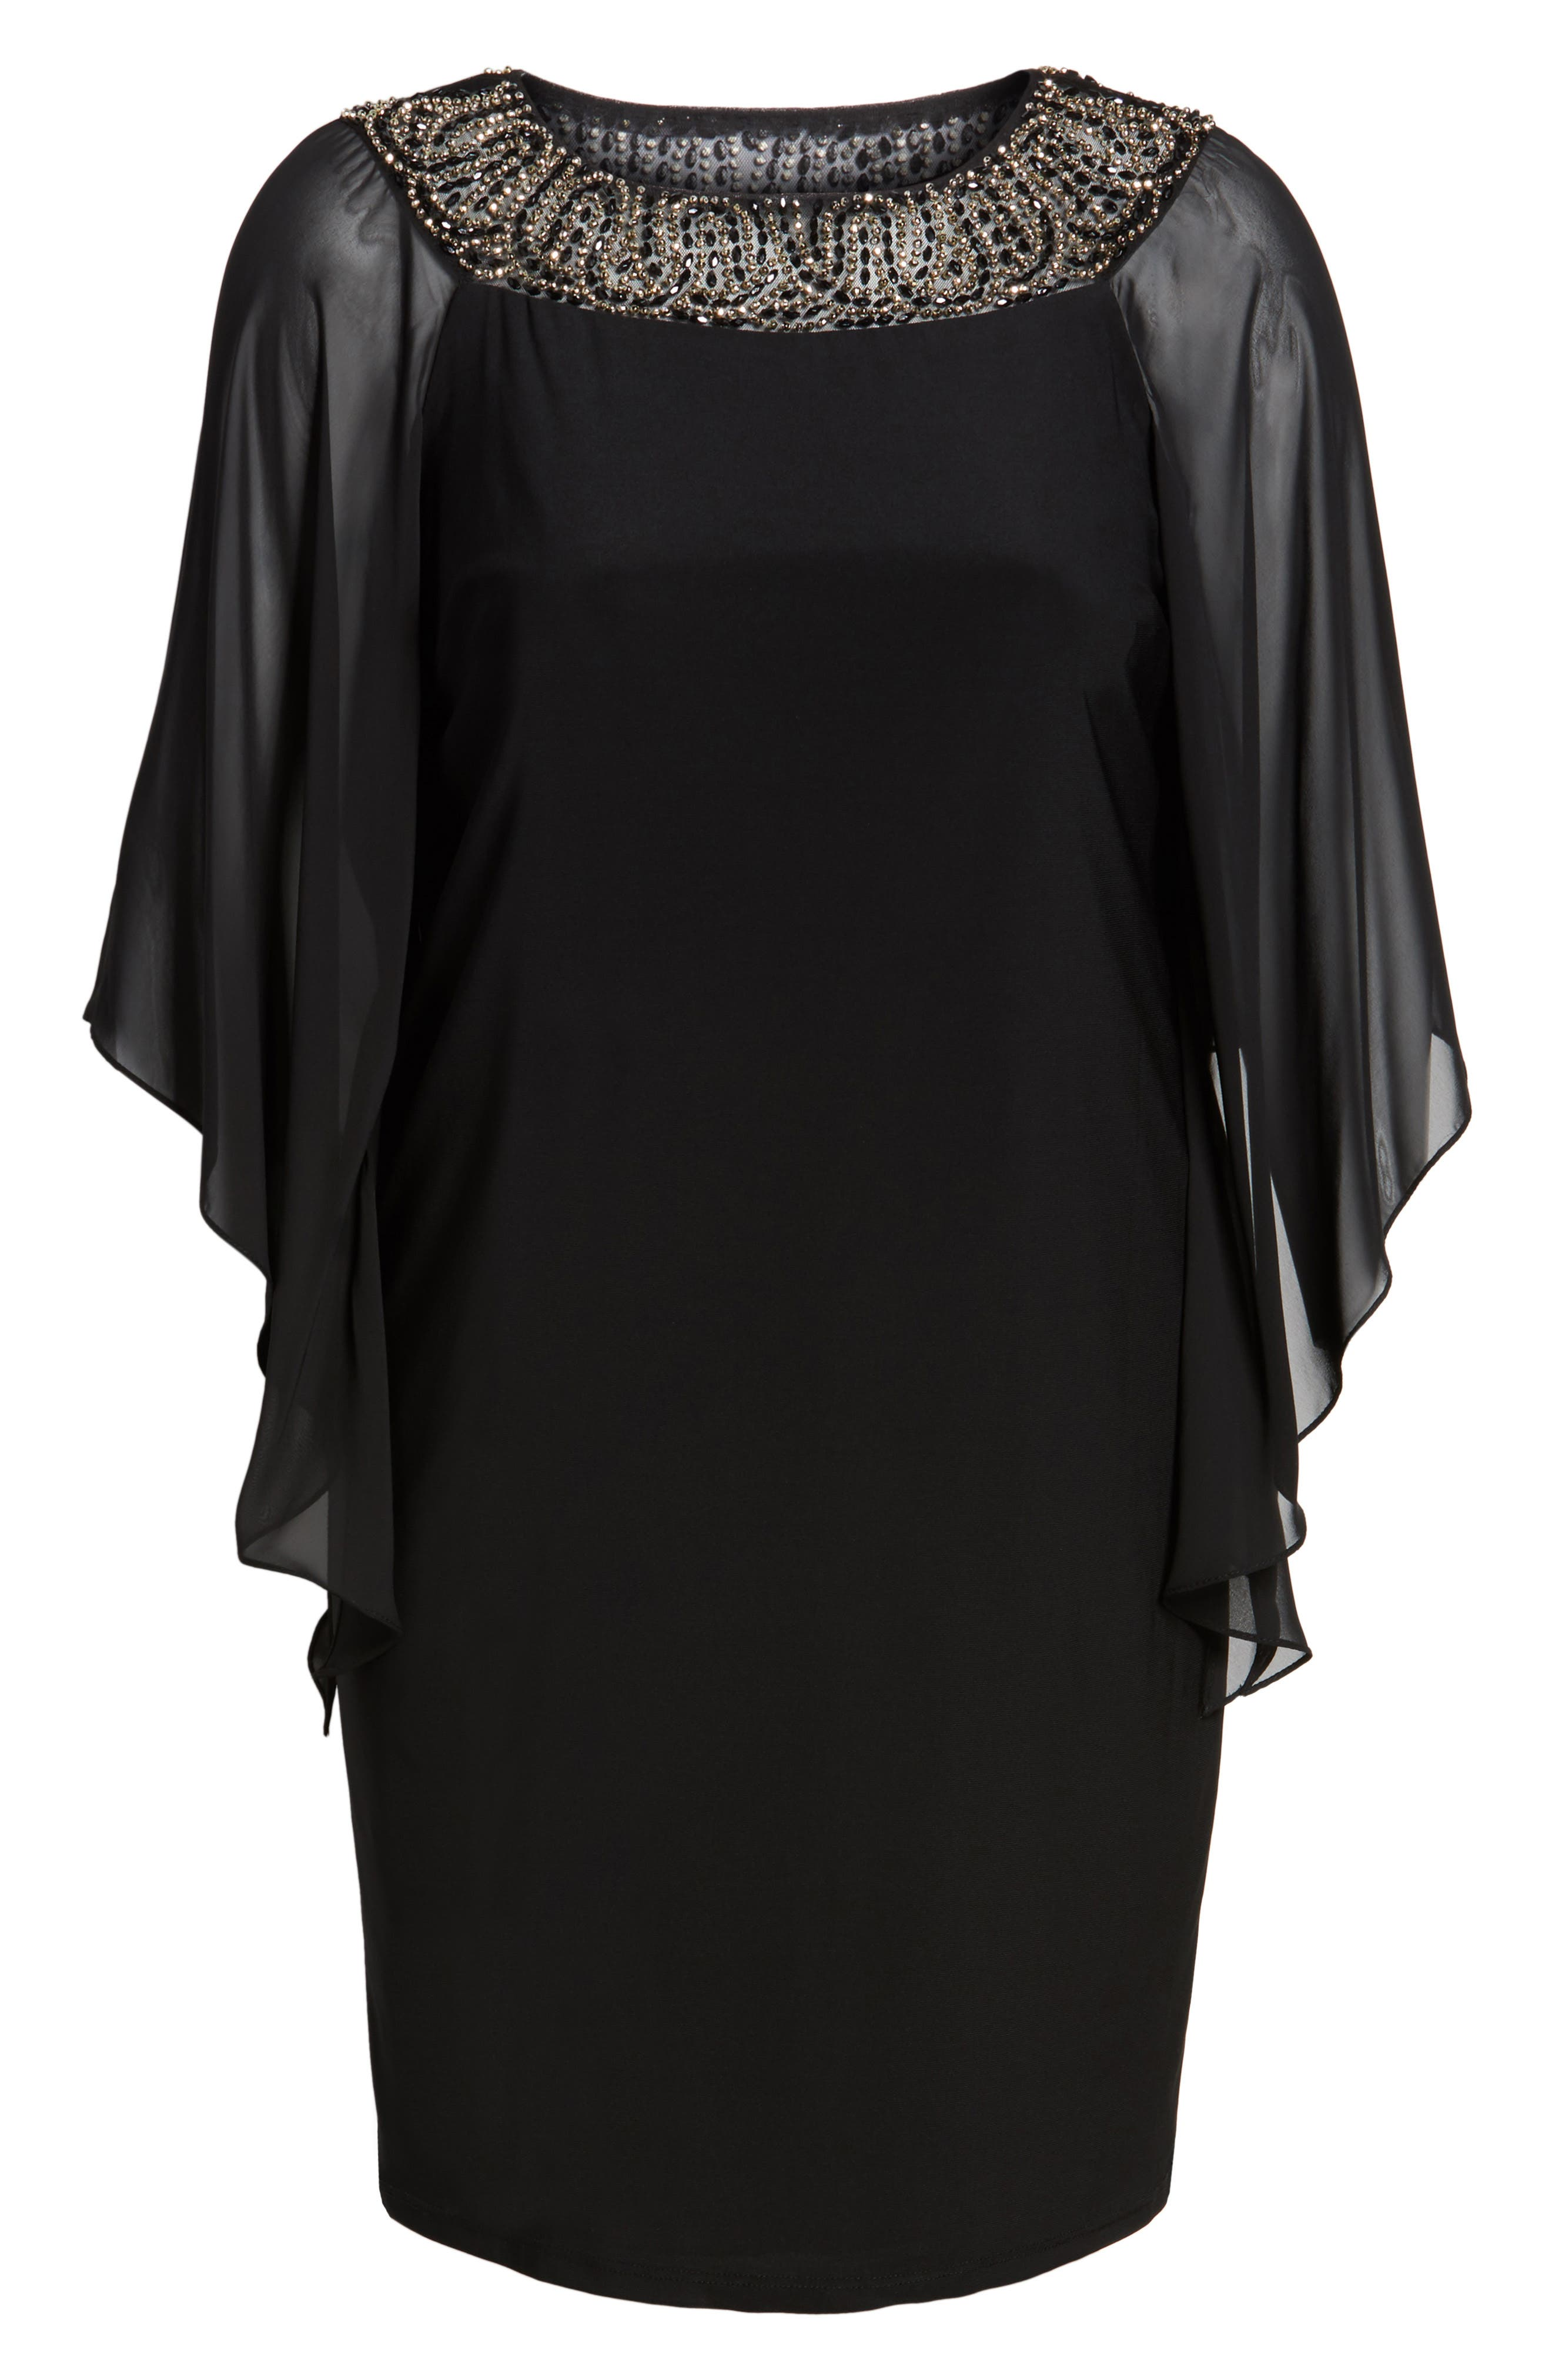 Beaded Chiffon Sleeve Sheath Dress,                             Alternate thumbnail 6, color,                             010